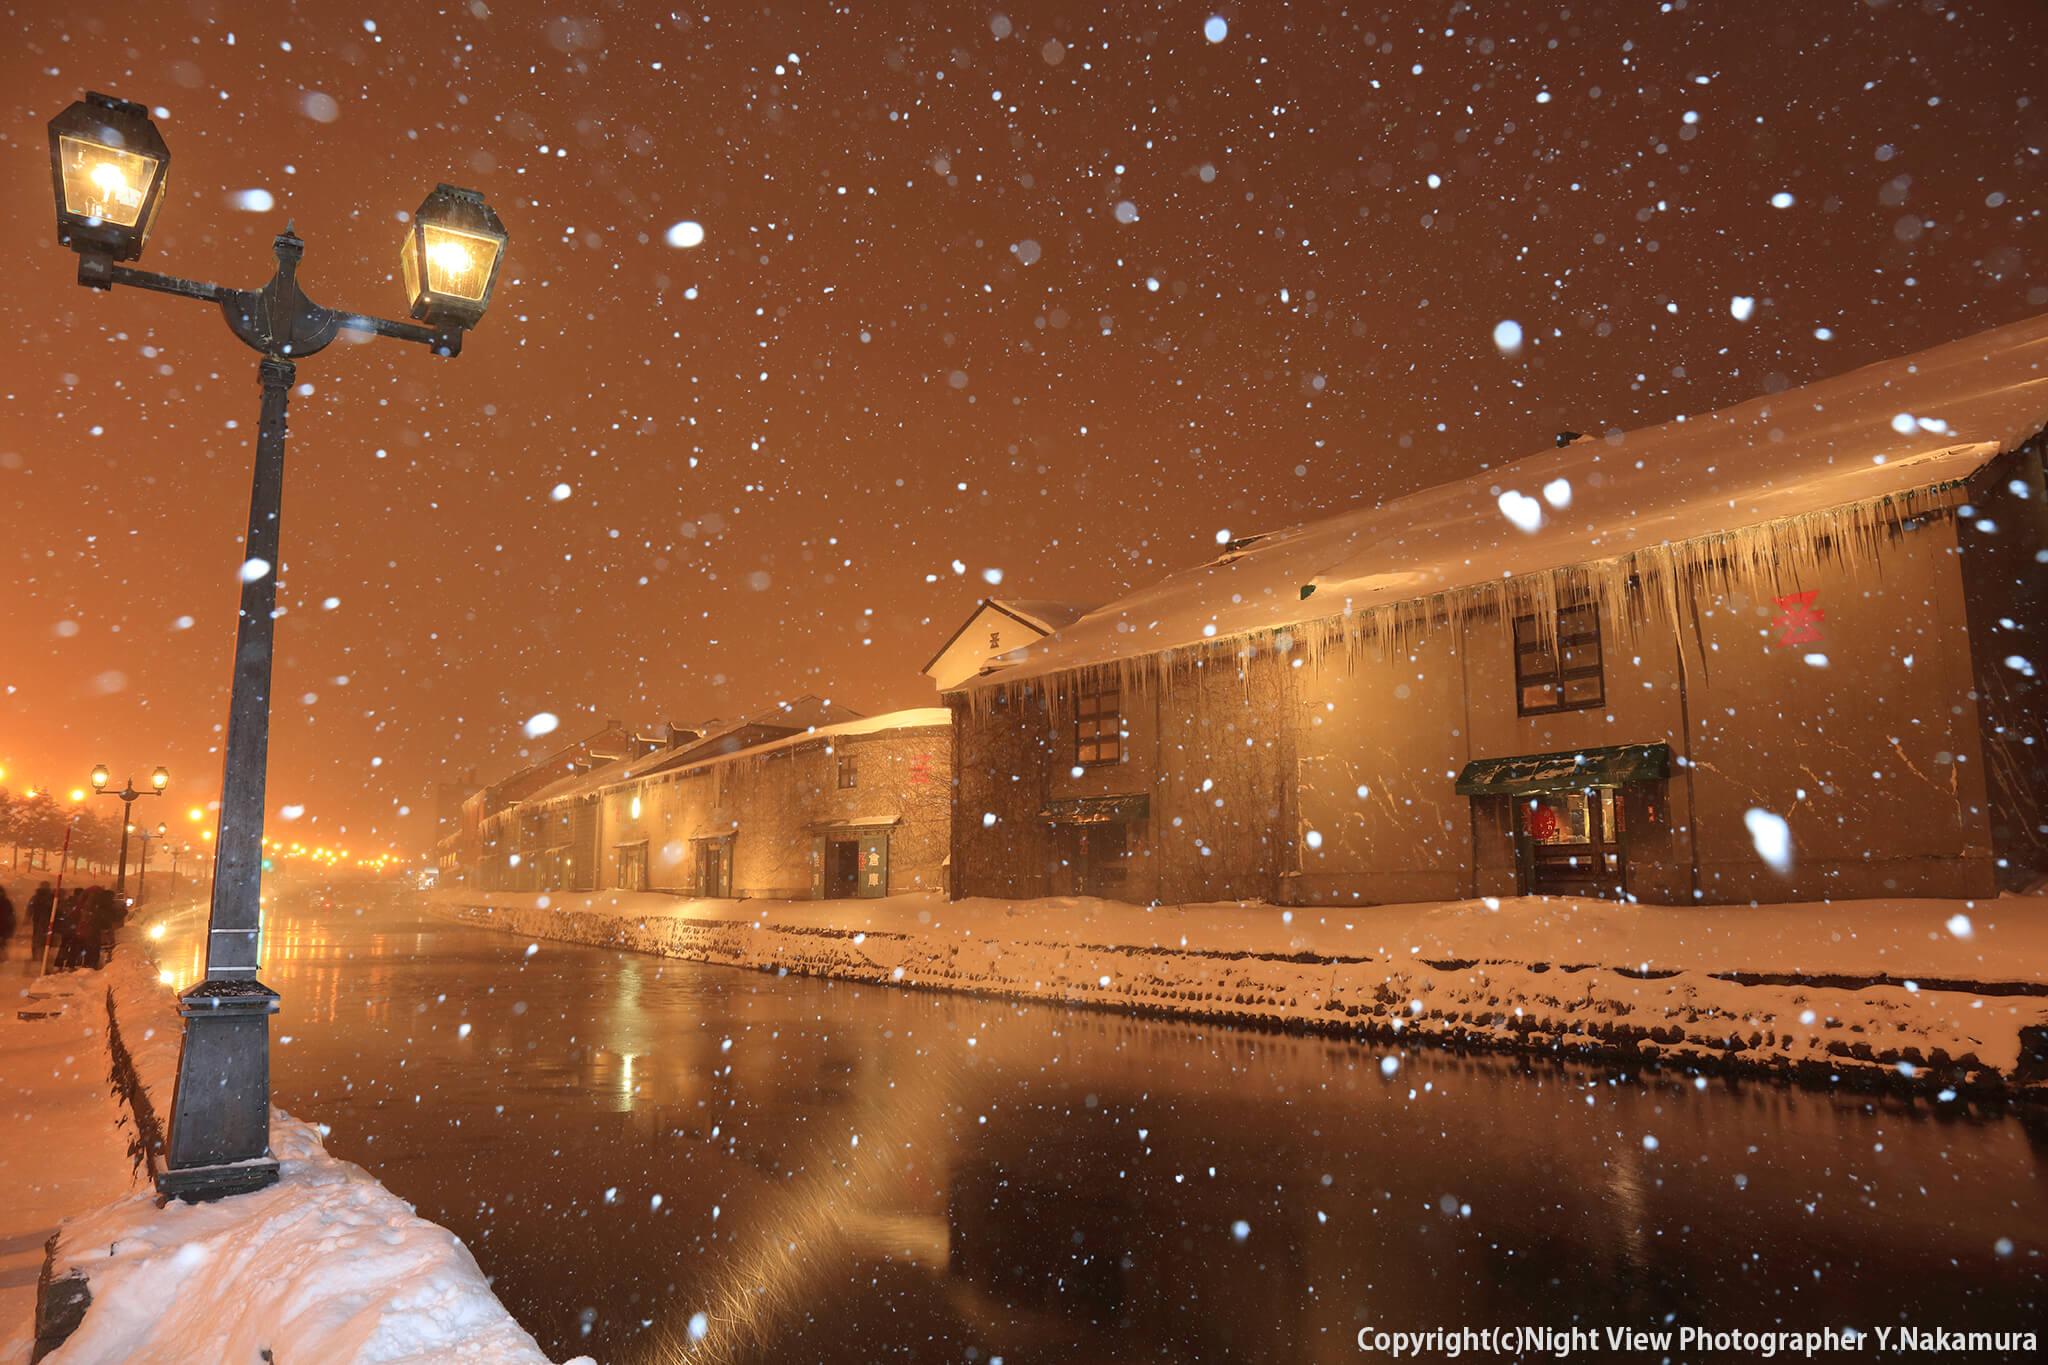 Photo of 水面に映り込む倉庫群のライトアップが美しい「小樽運河」